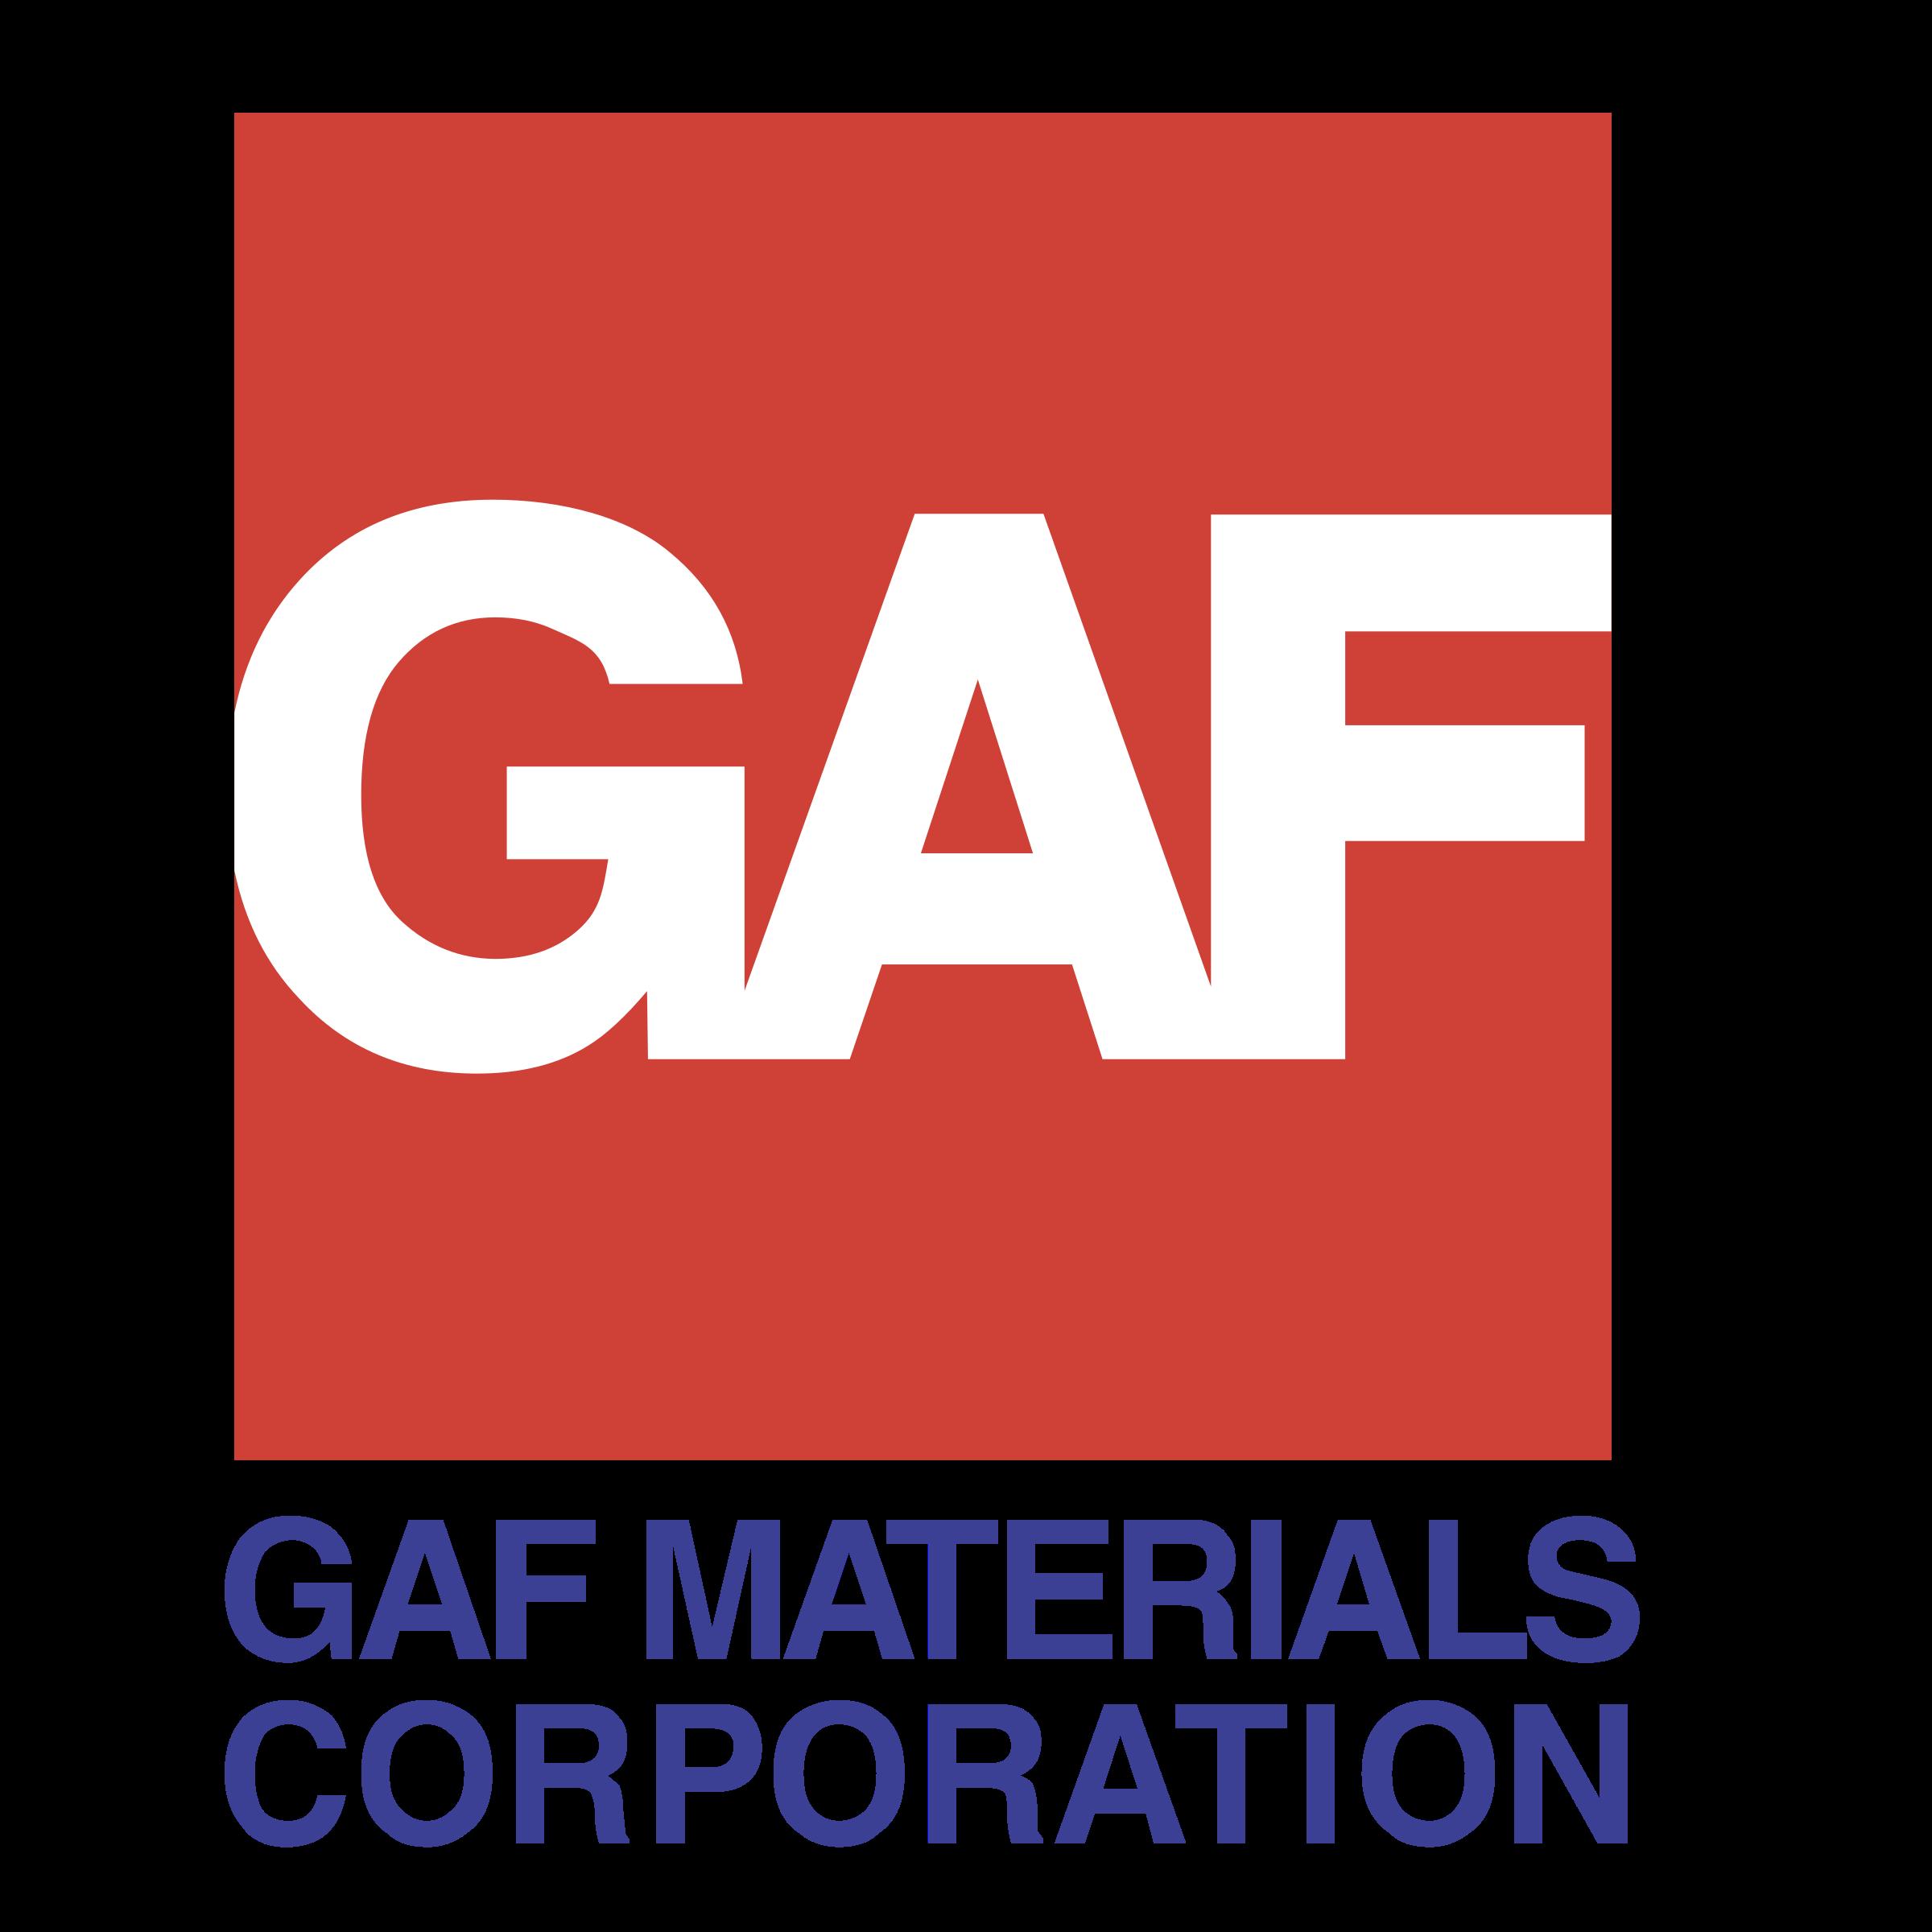 gaf-materials-corporation-logo-png-transparent-1